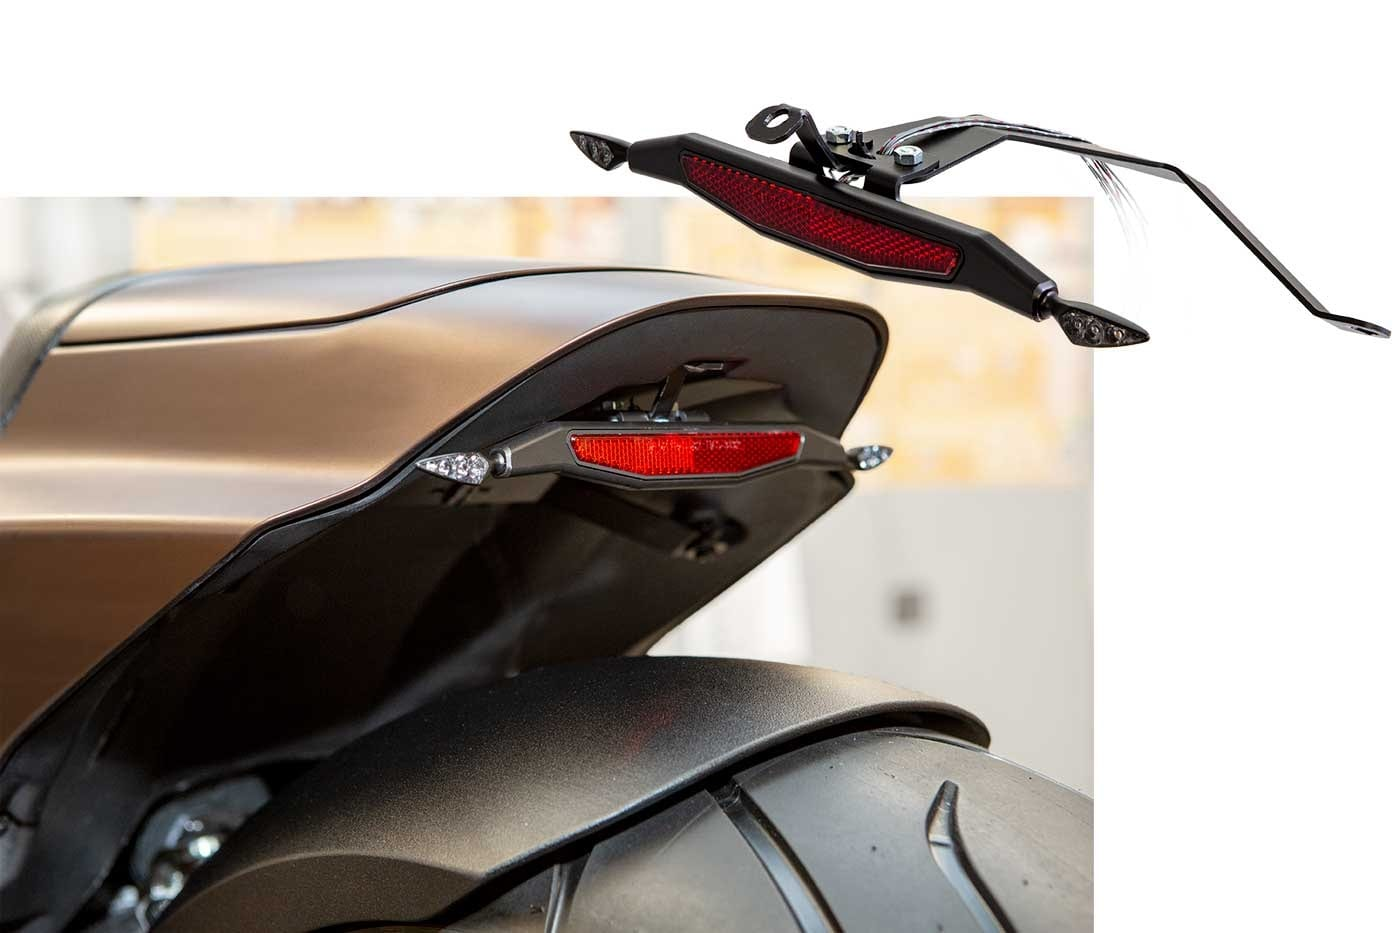 Blinkerhalter hinten Harley-Davidson FXDR 114